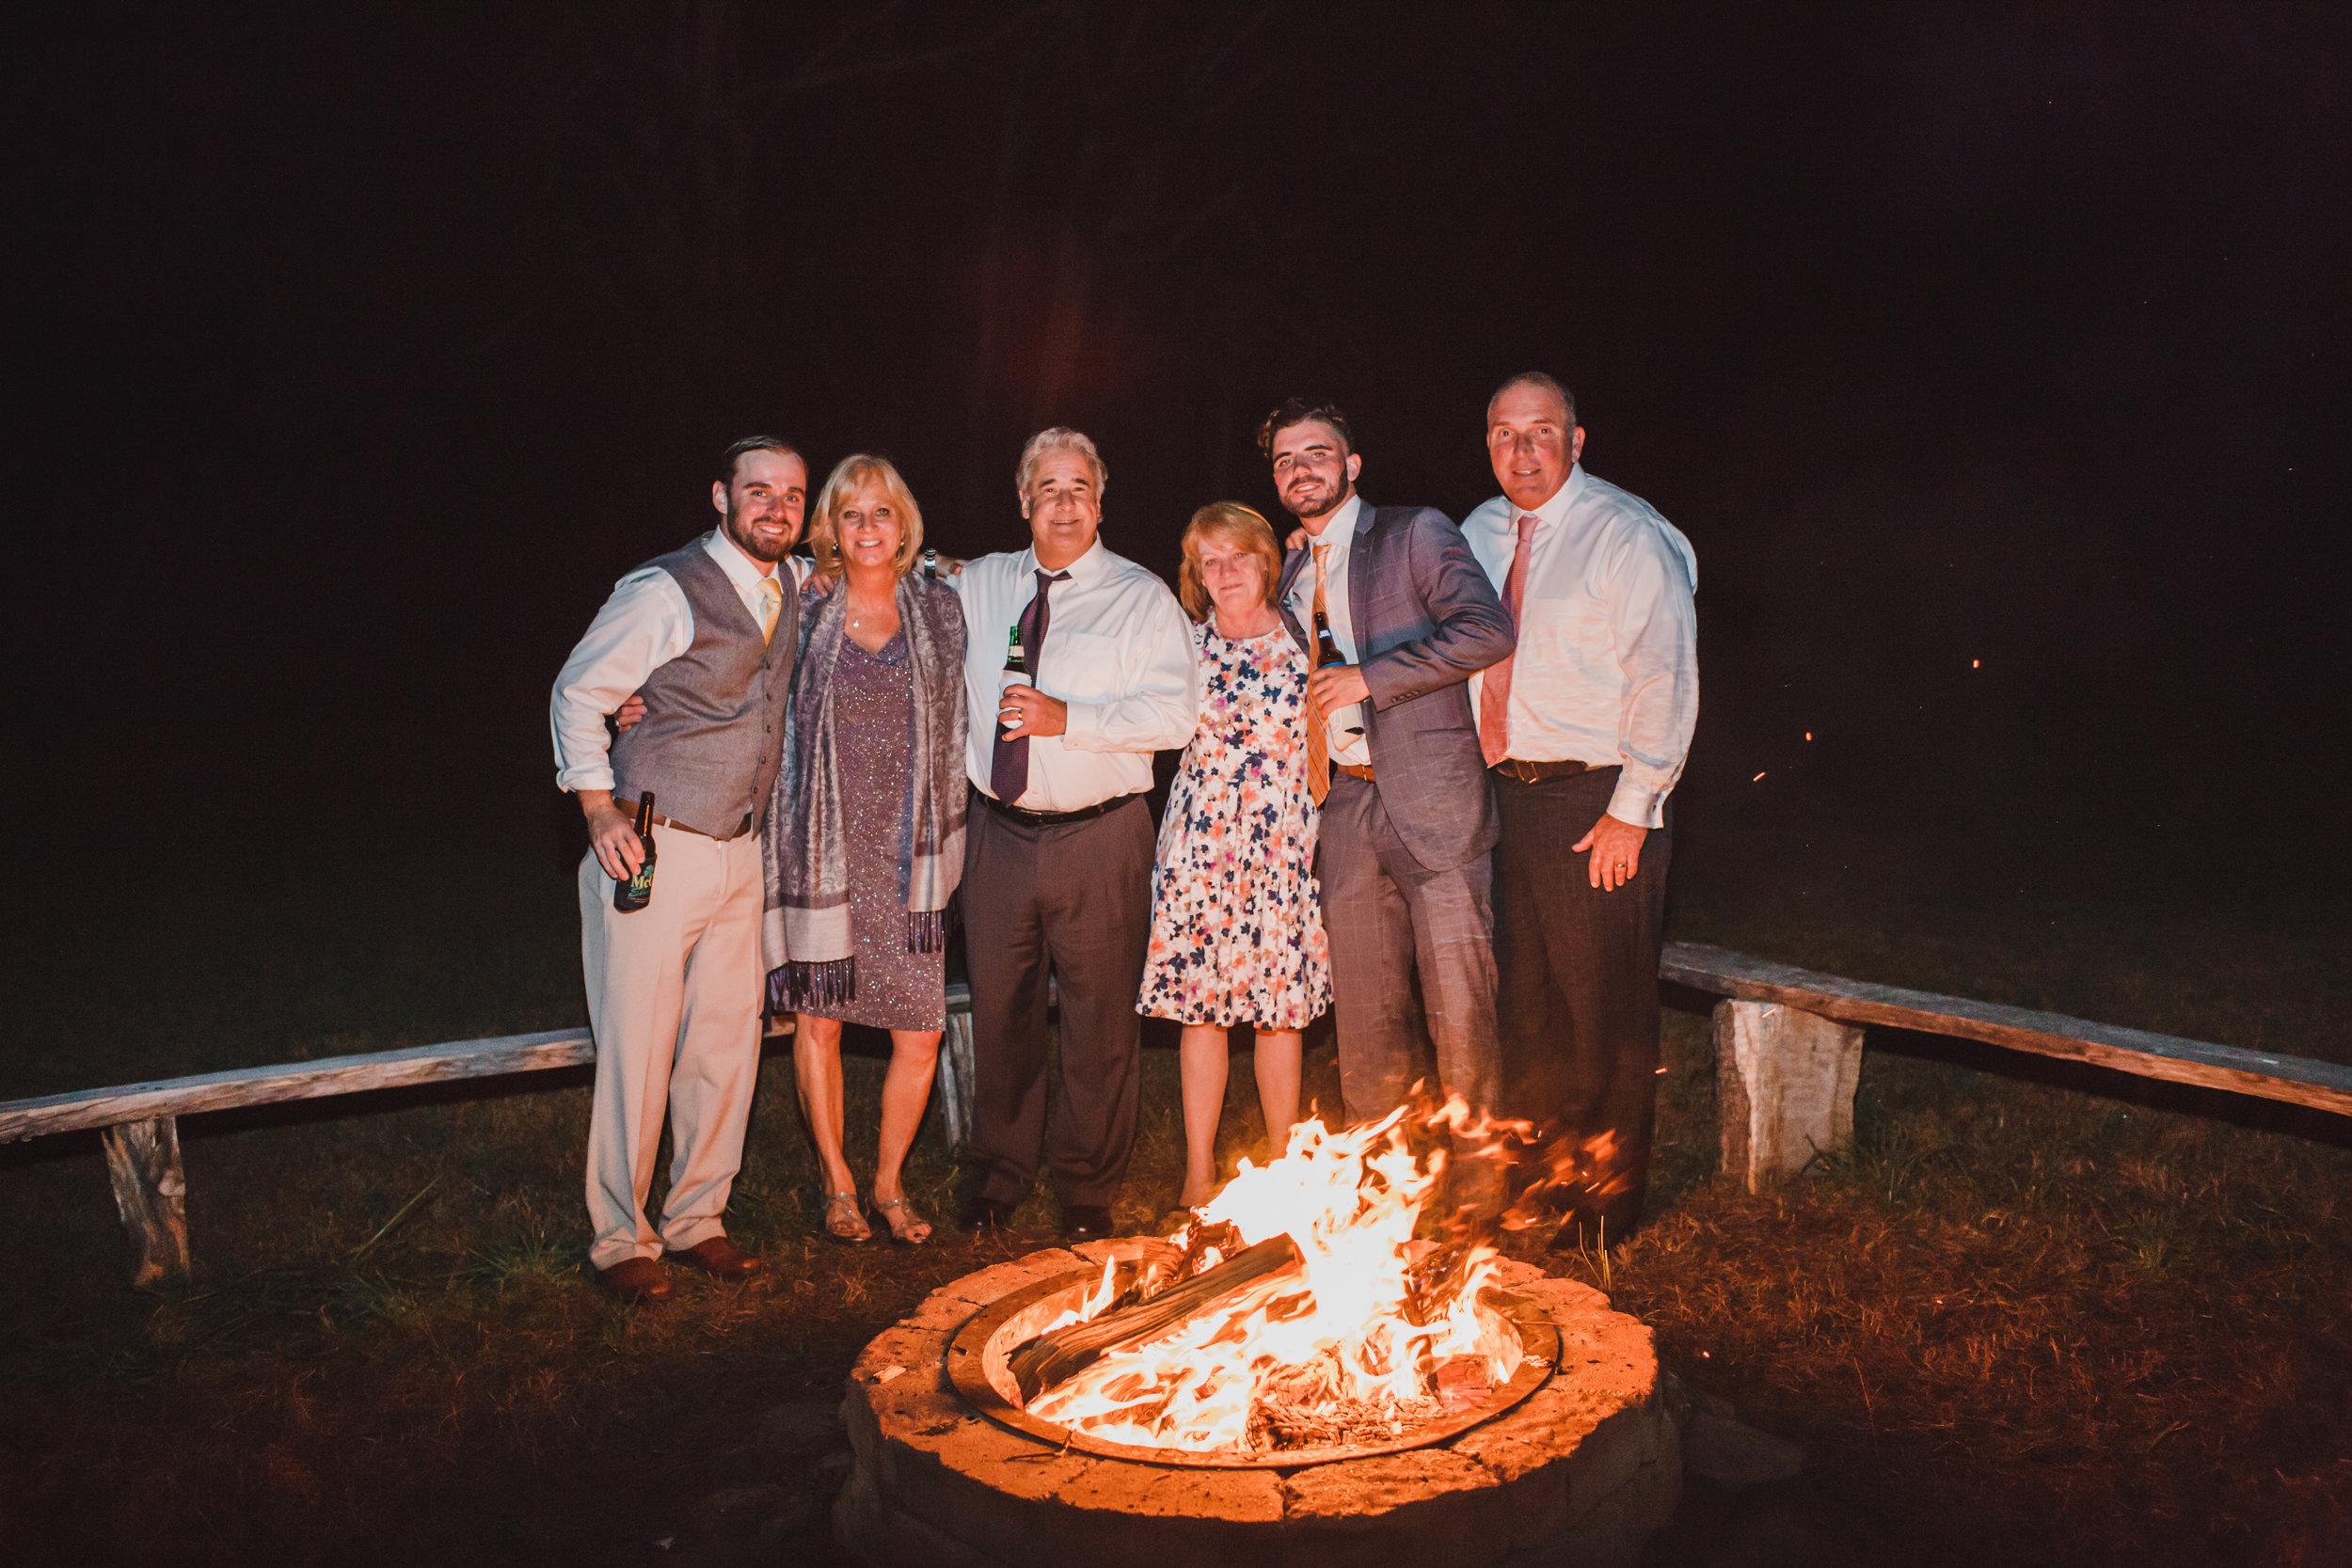 Fling - Virginia Wedding Photographer - Photography by Amy Nicole-996-13.jpg